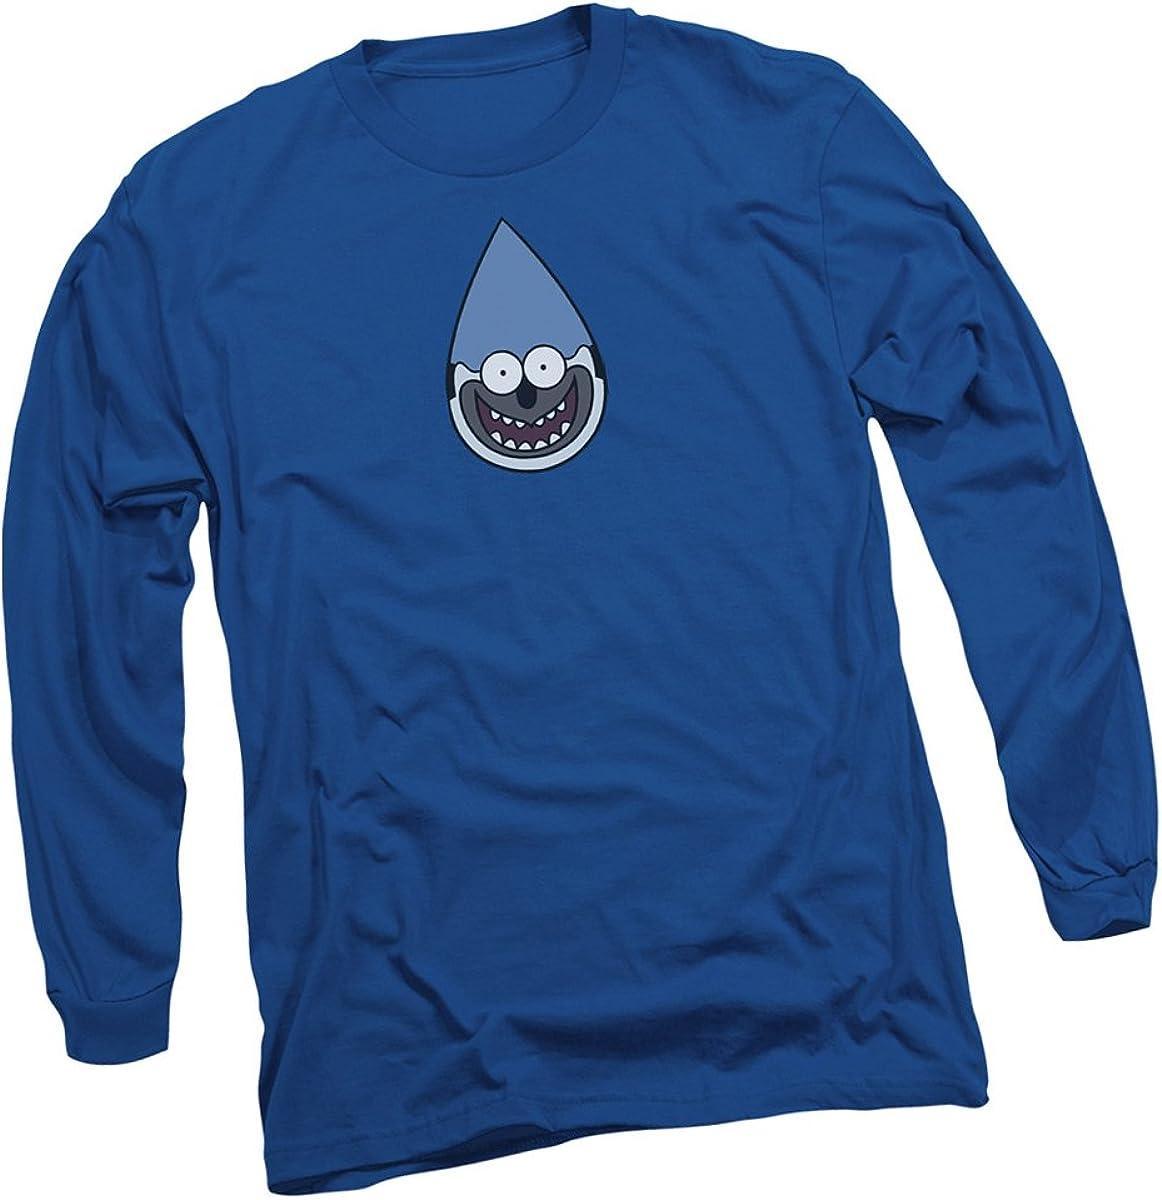 Regular Show Cartoon Series MORDECAI Licensed Adult T-Shirt All Sizes